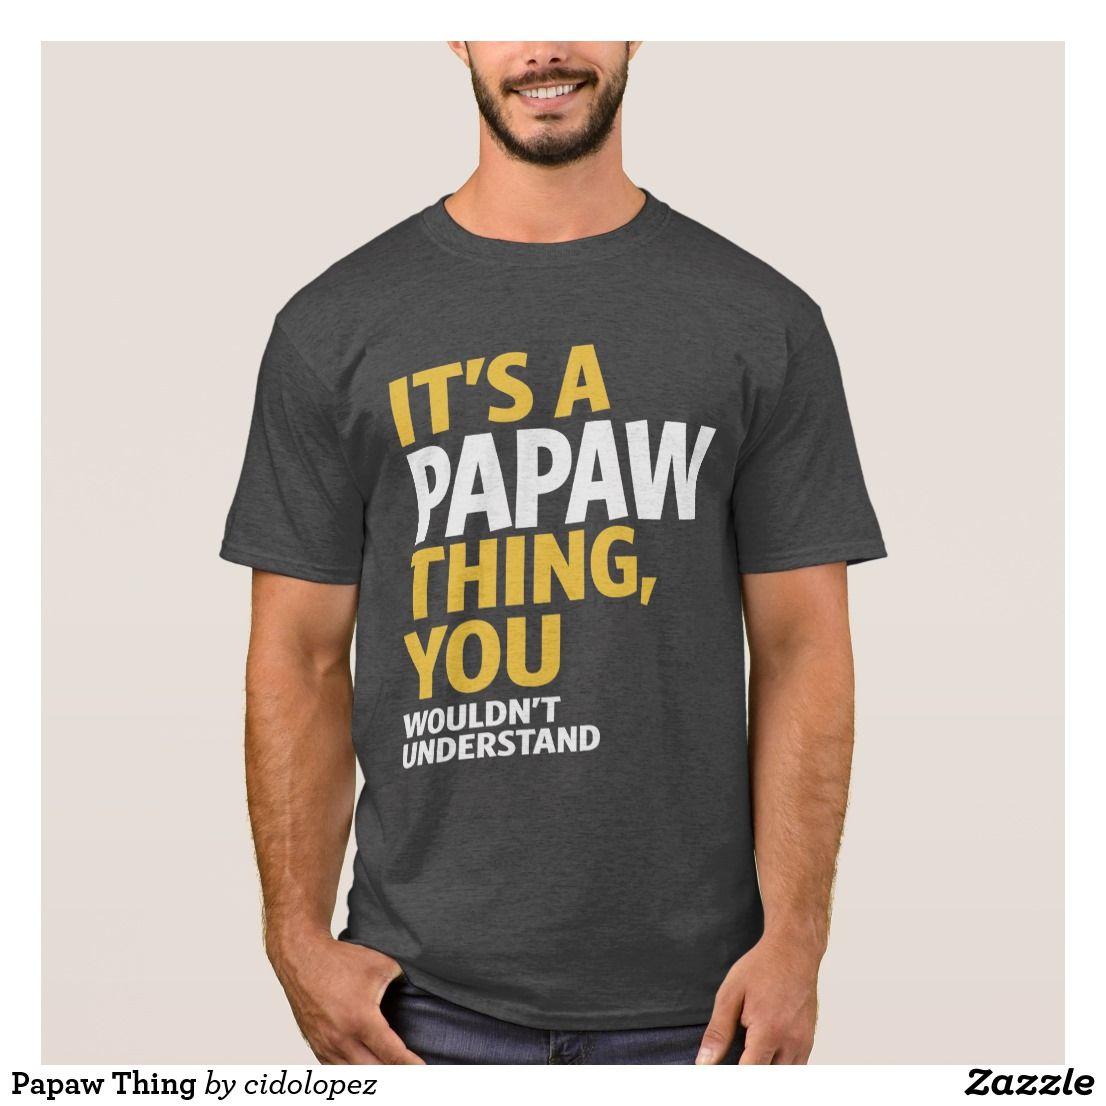 Papaw Thing T Shirt Papaw Tees Shirts T Shirt Shirt Designs